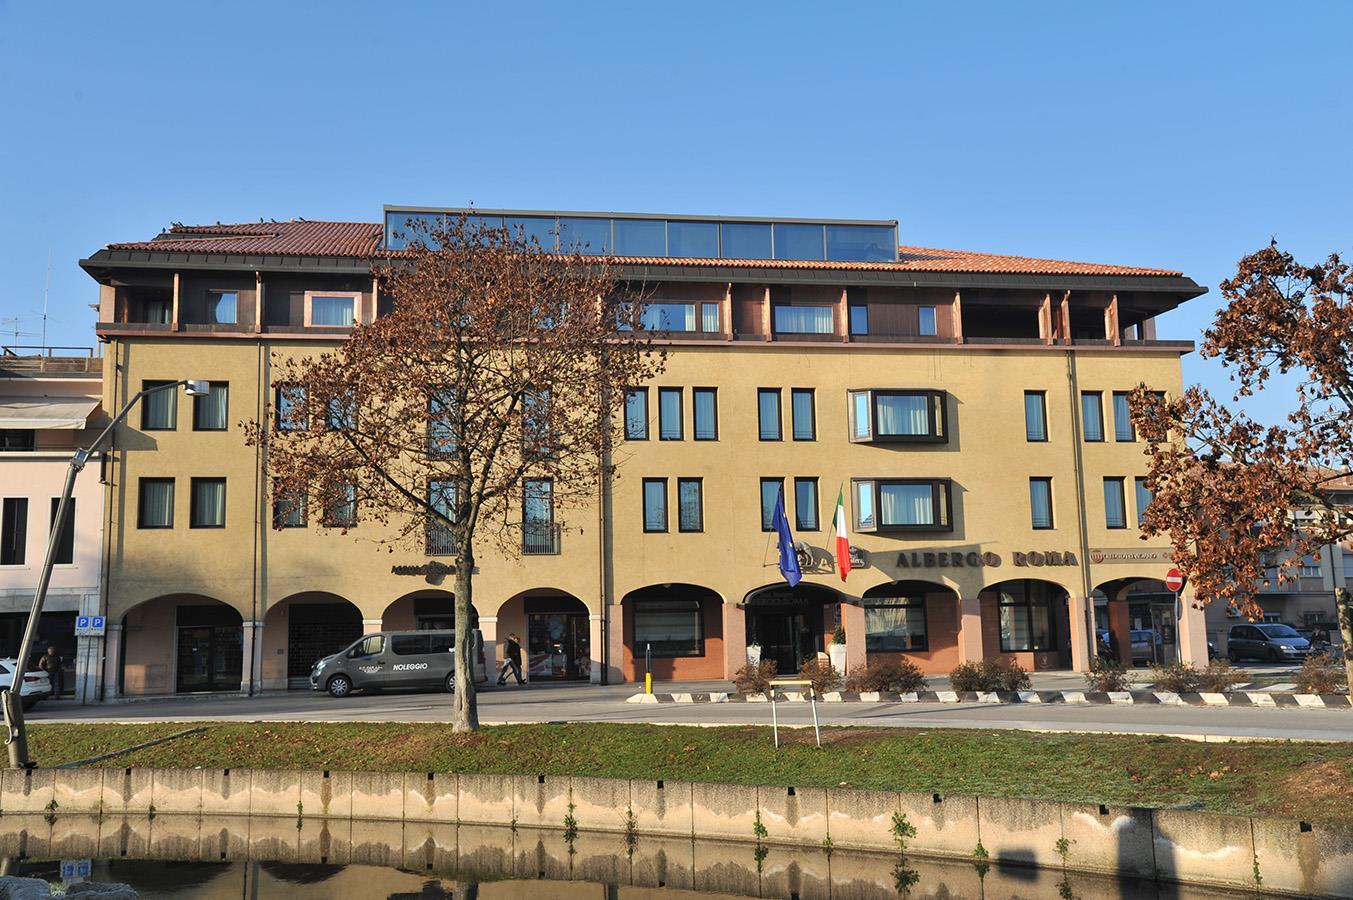 Hotel In Castelfranco Veneto Bw Signature Collection